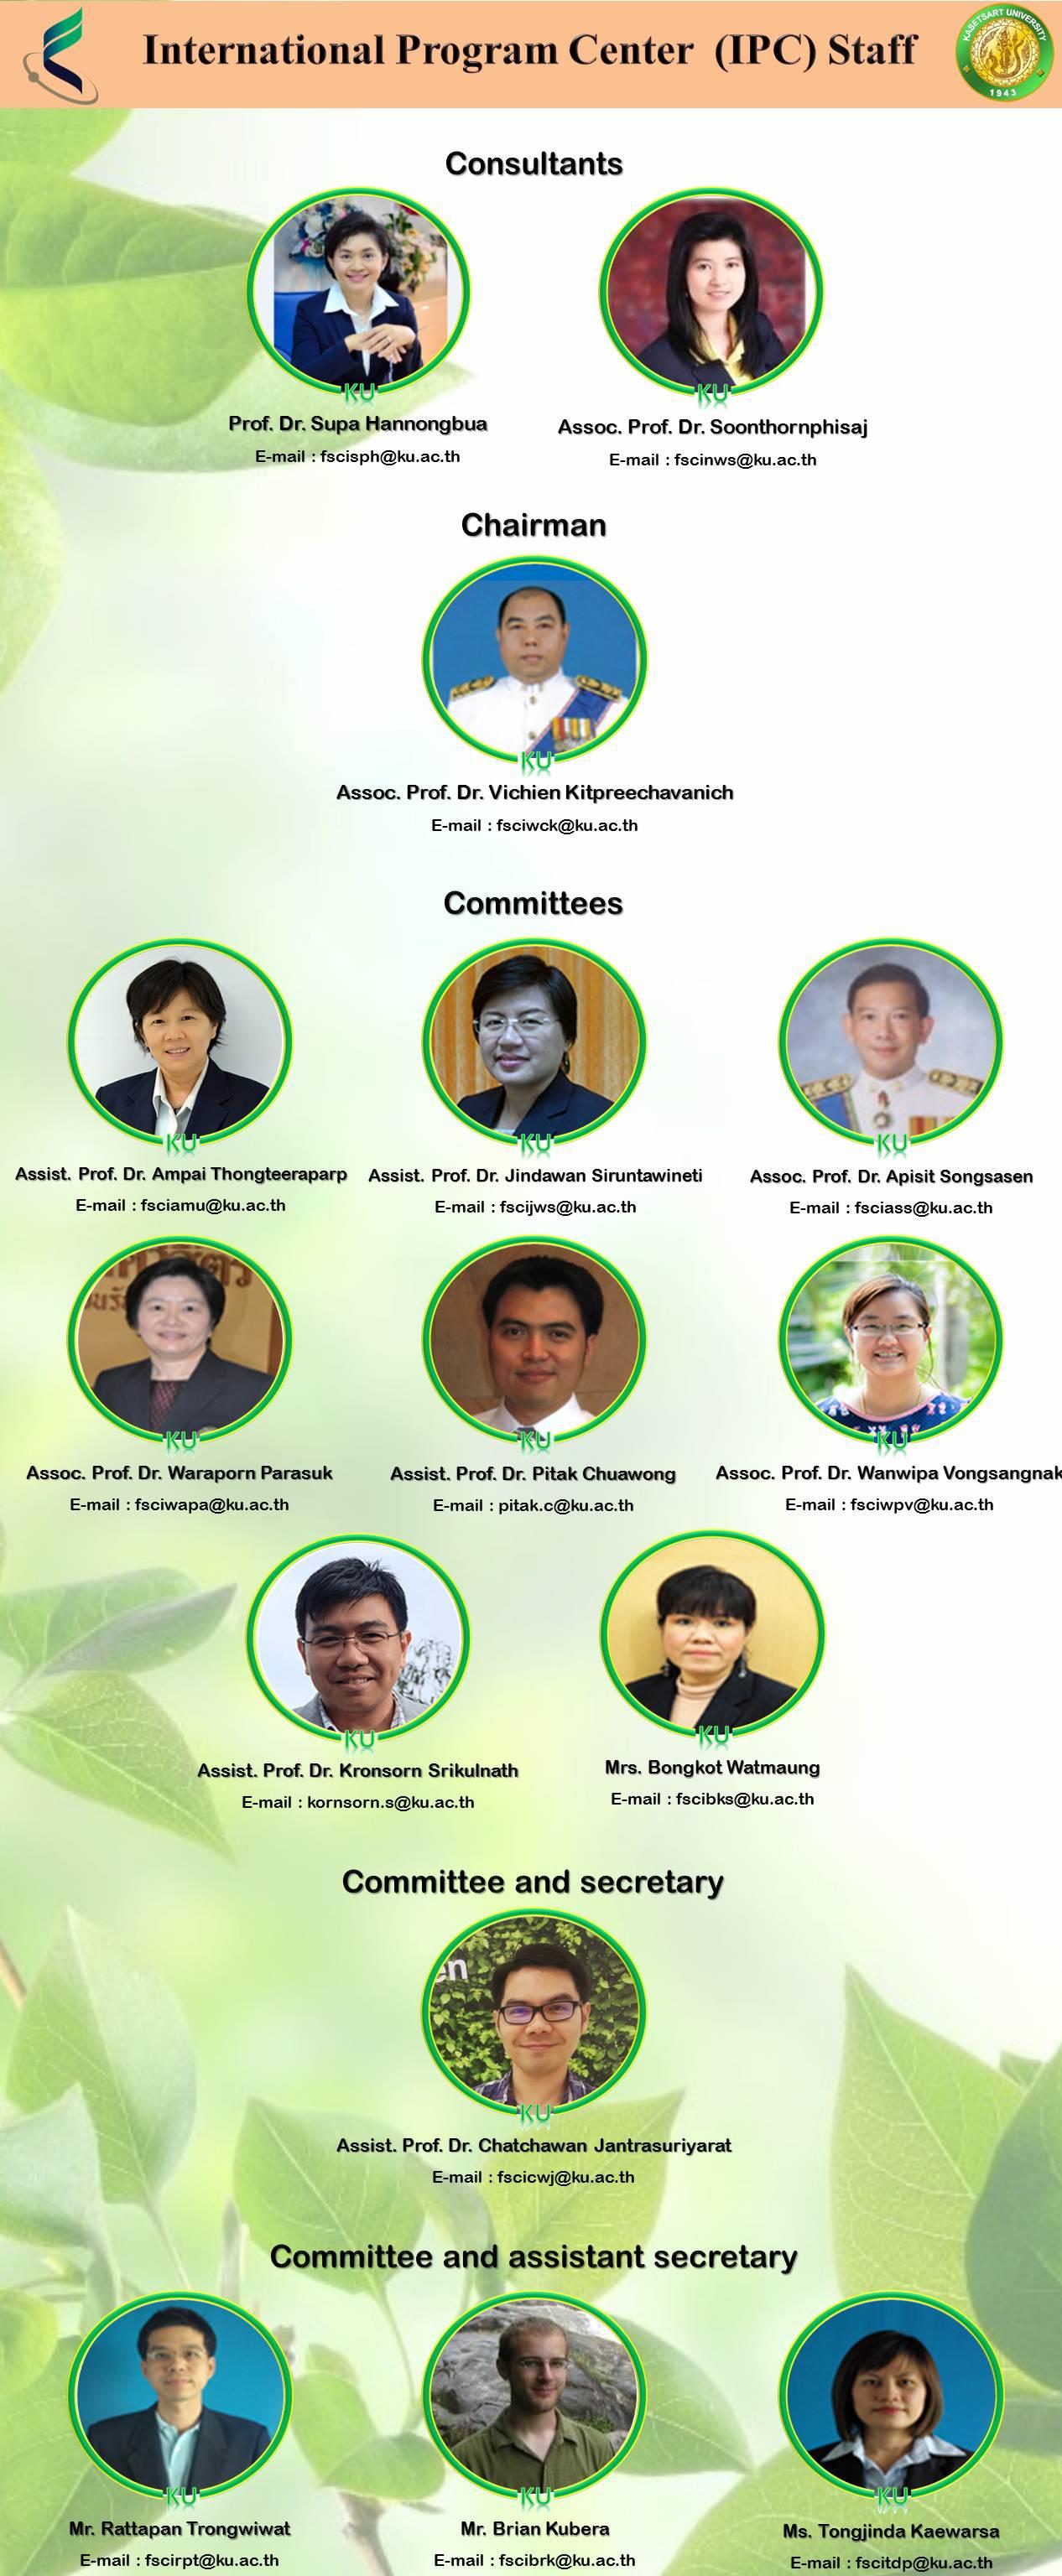 IPC staff poster